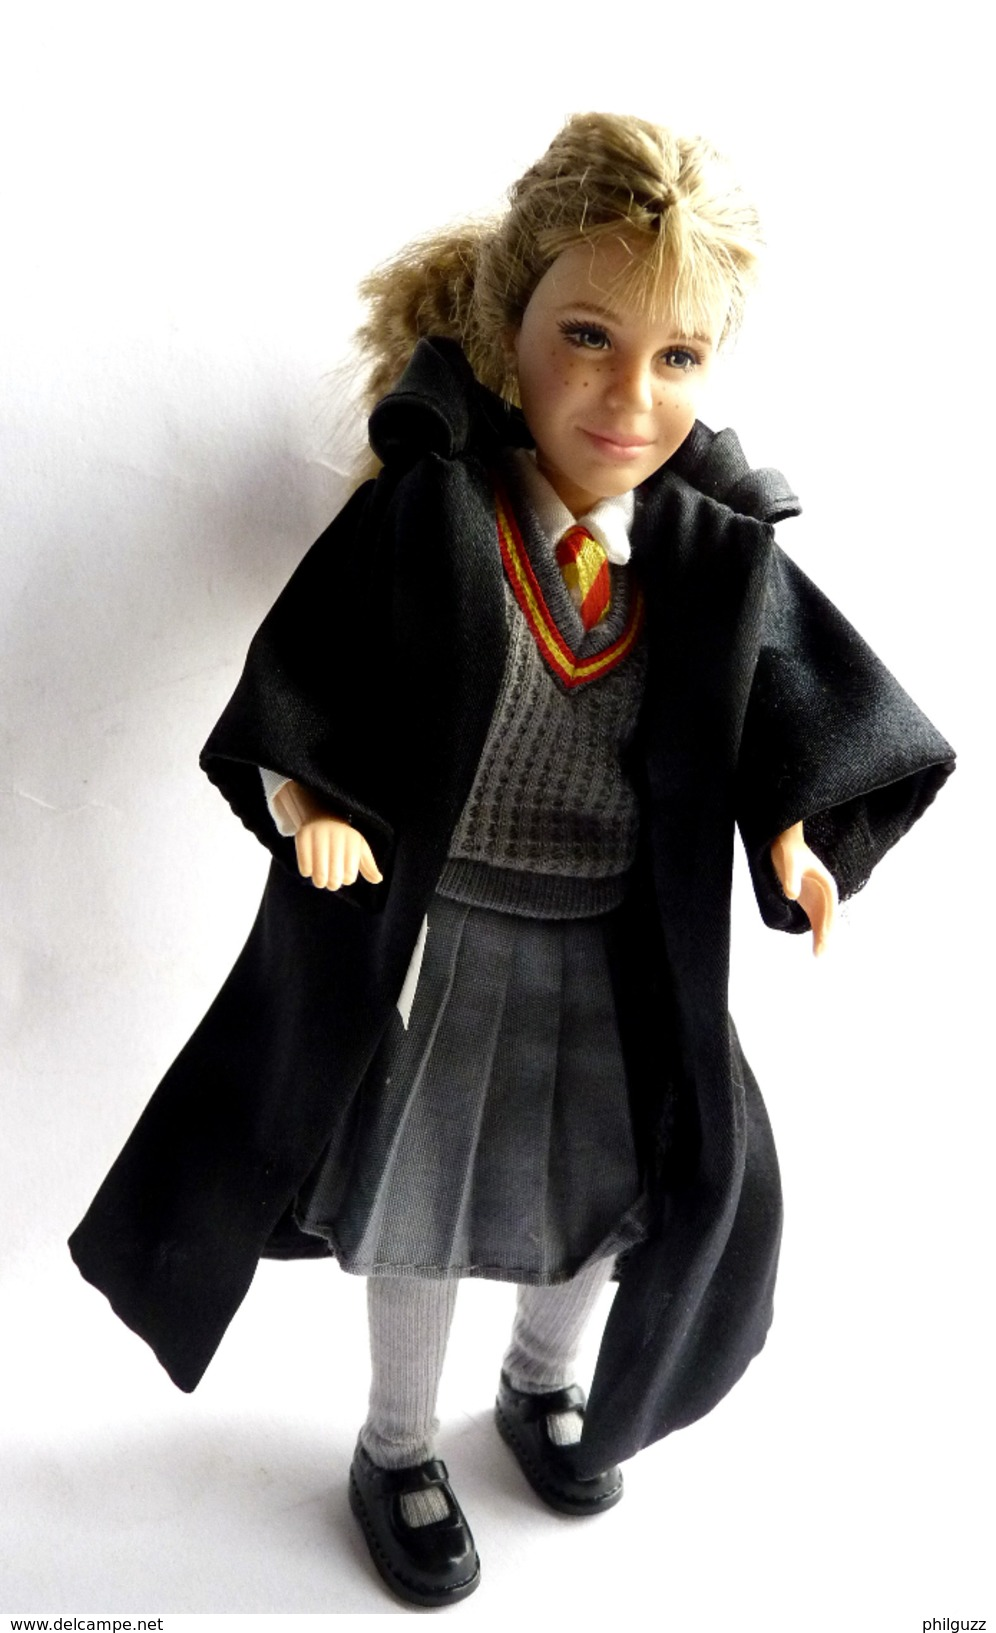 FIGURINE POUPEE HARRY POTTER MATTEL 2001 HERMIONE GRANDGER - Harry Potter